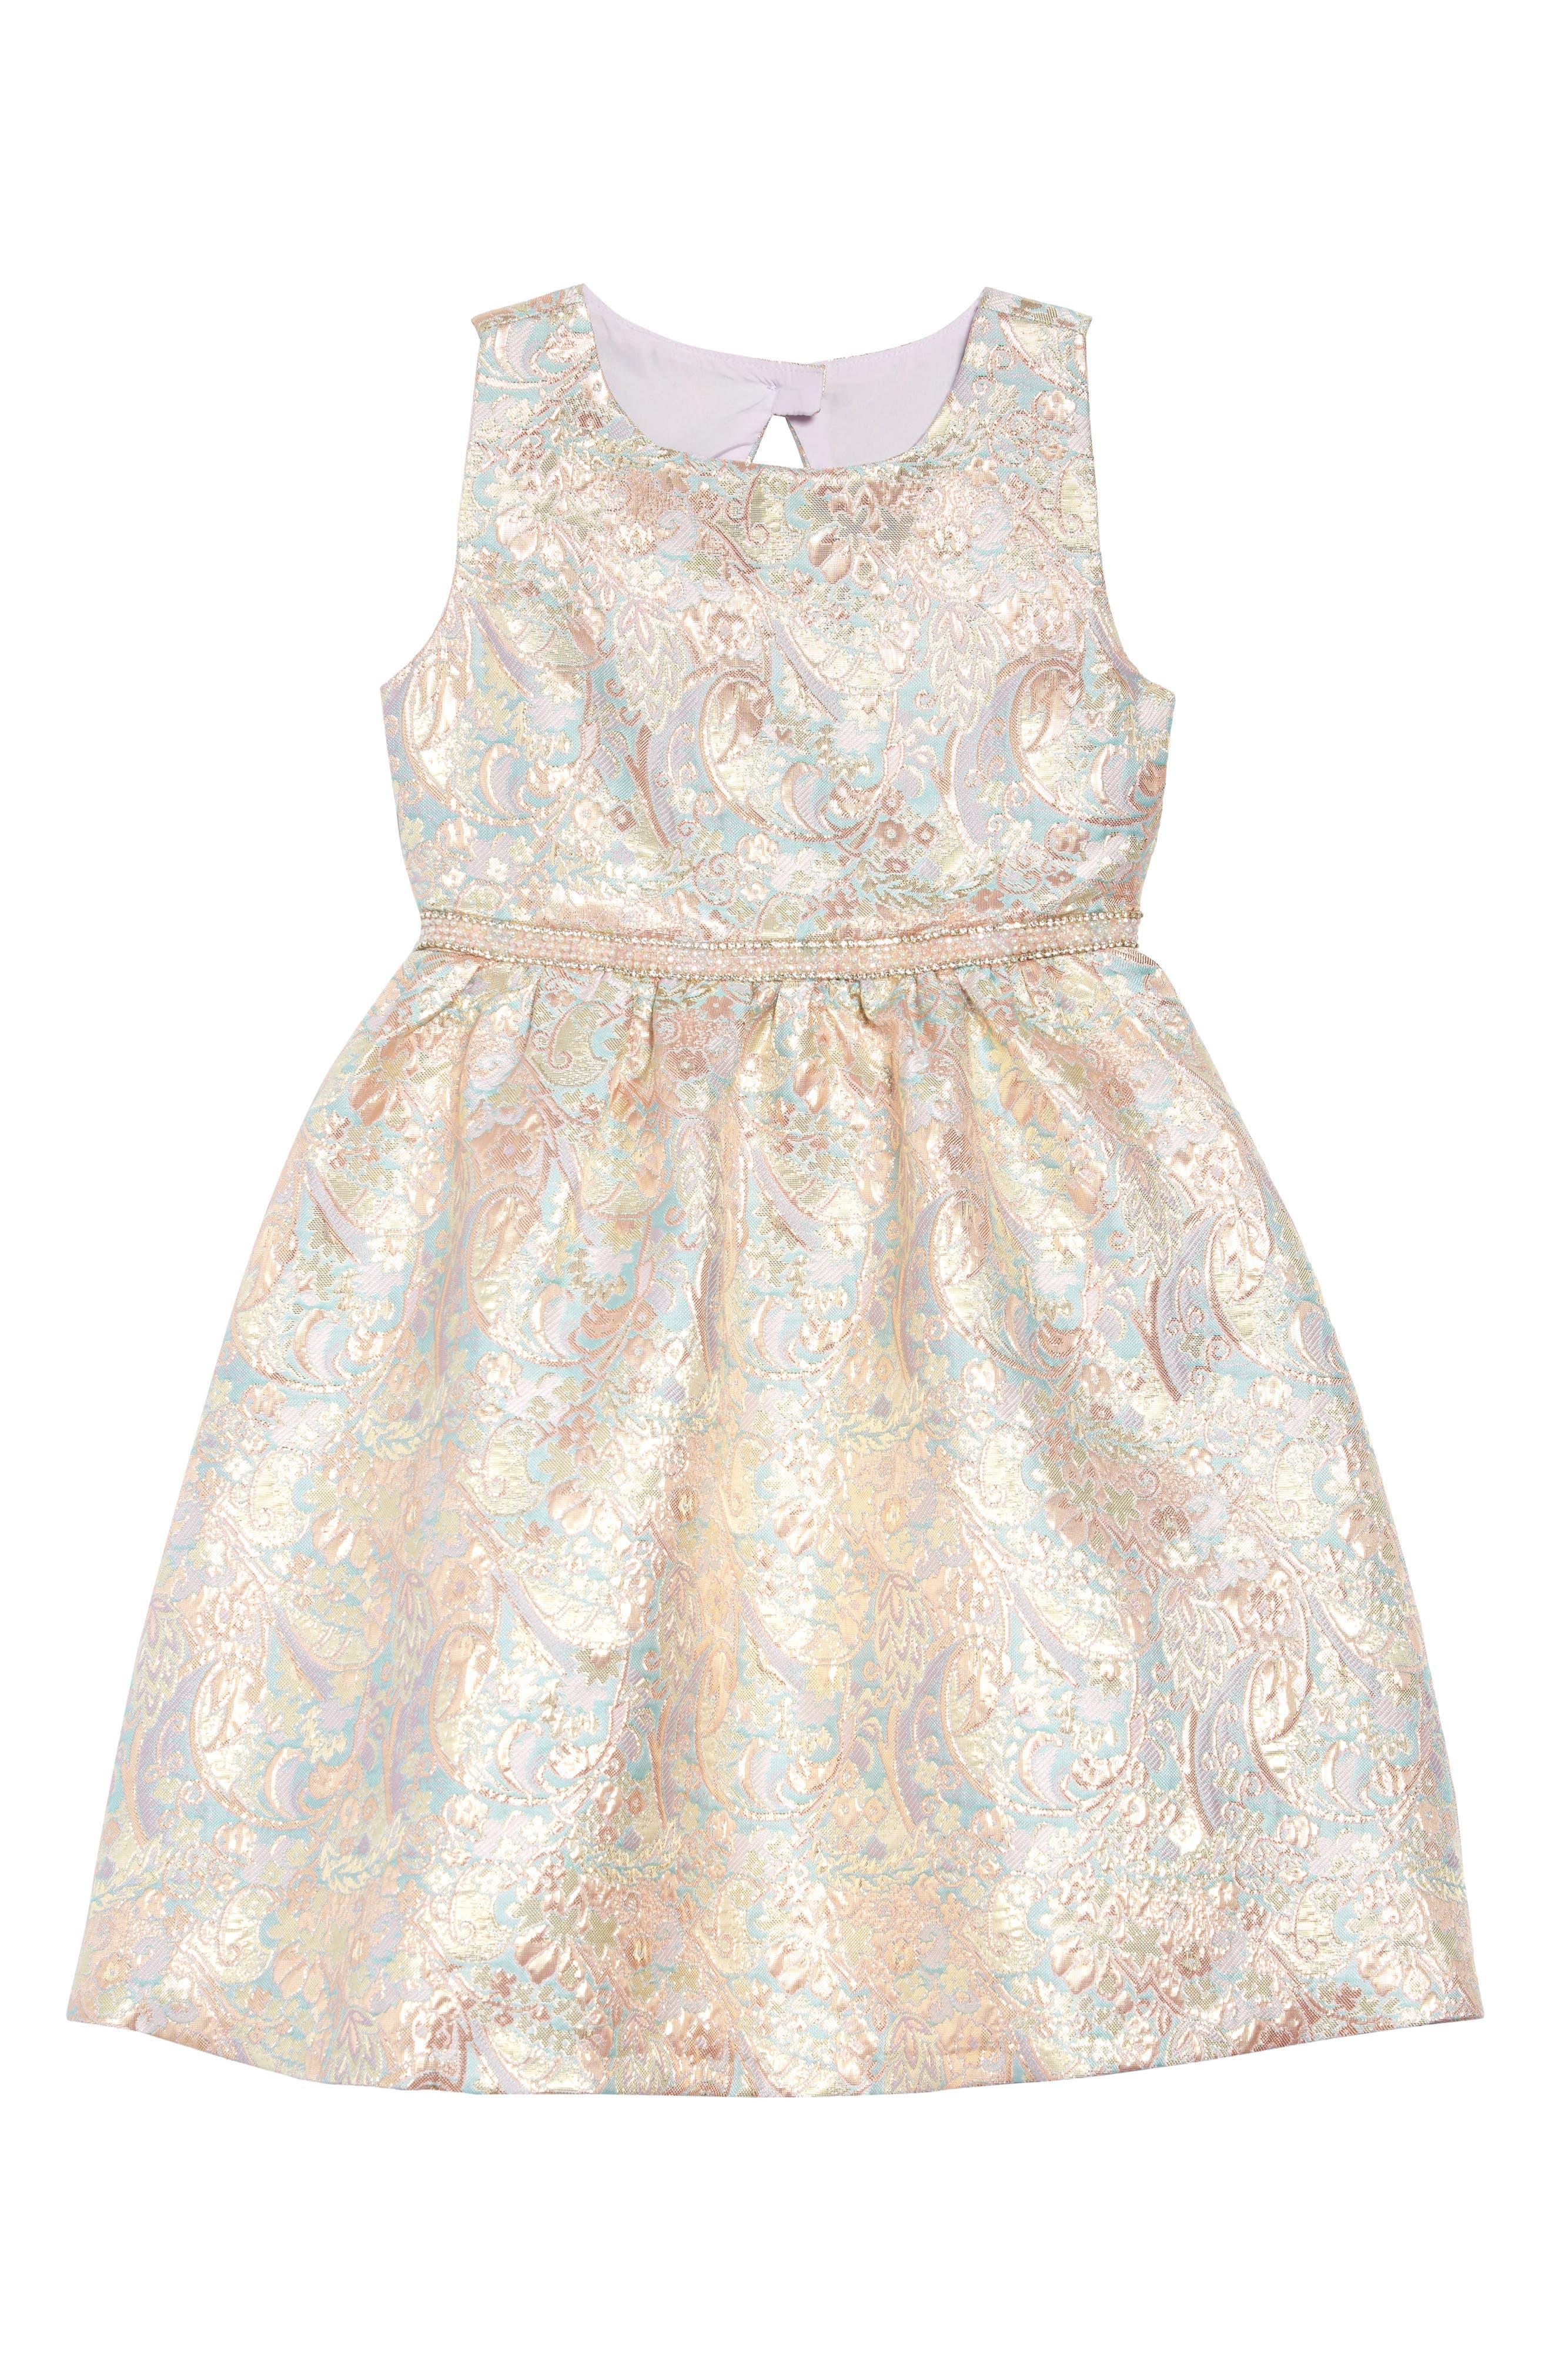 IRIS & IVY, Paisley Jacquard Bow Back Dress, Main thumbnail 1, color, BLUSH